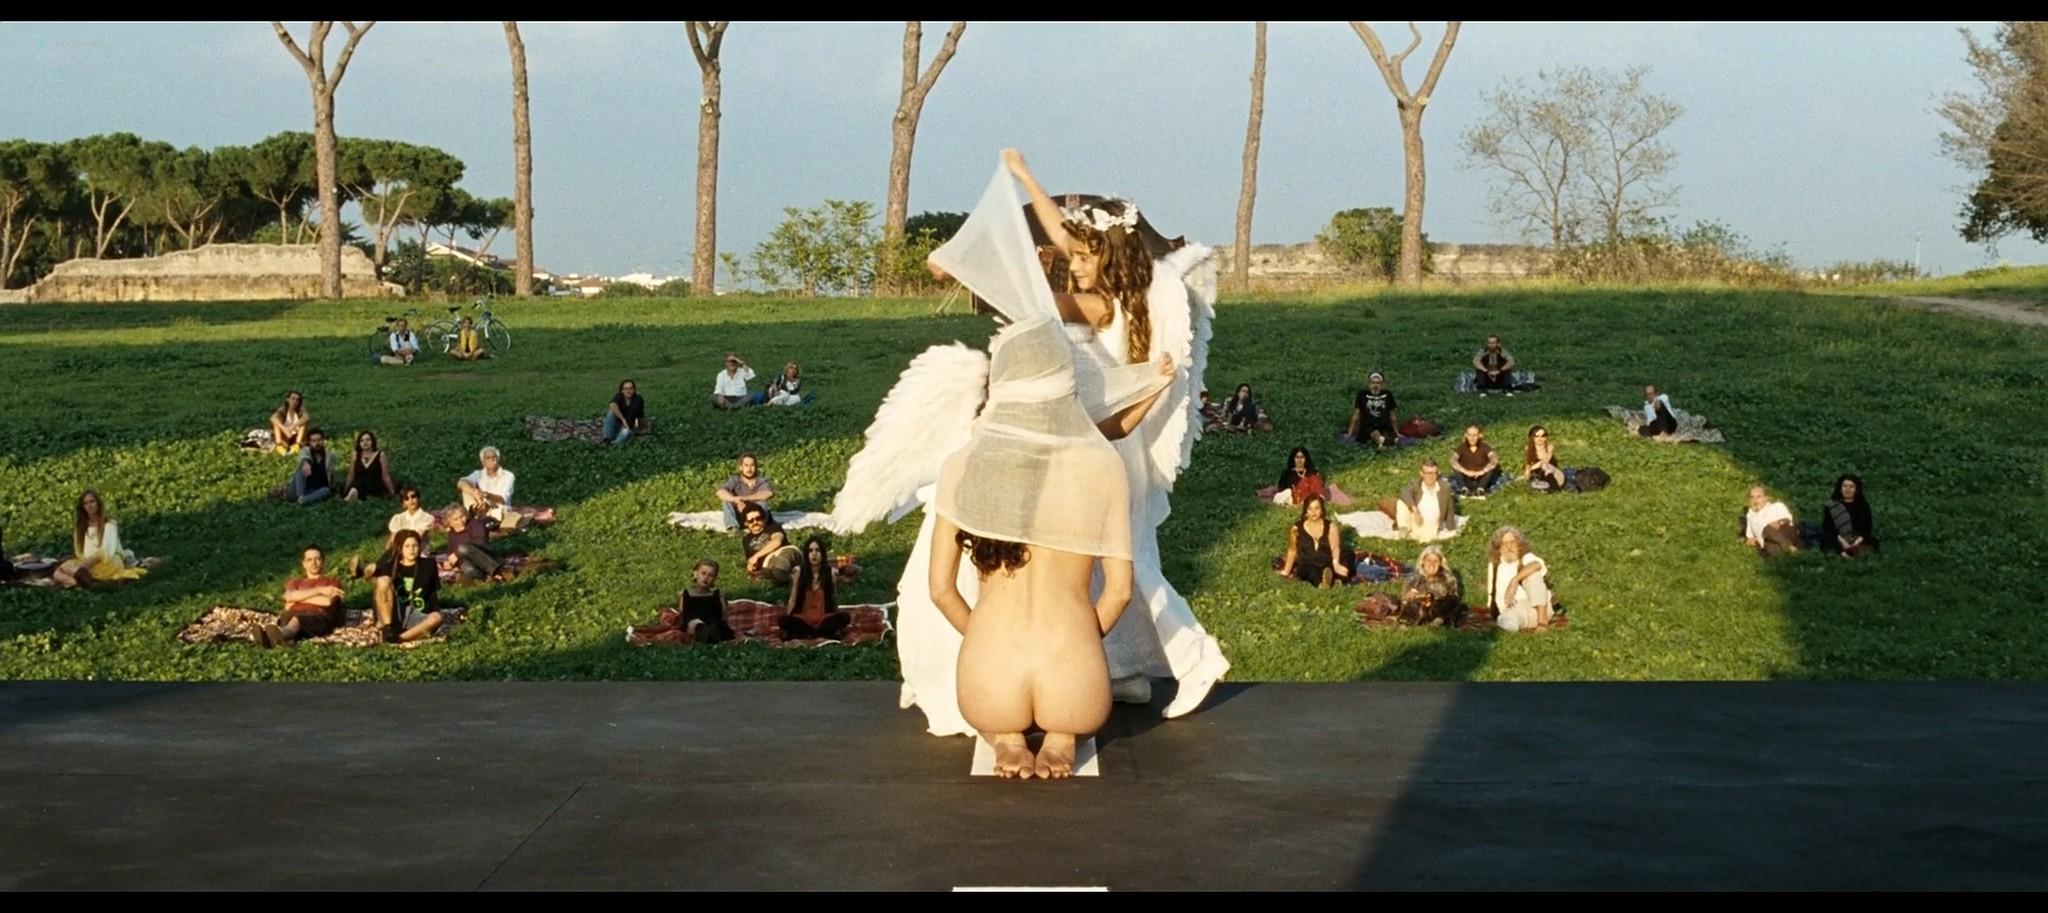 Sabrina Ferilli nude Anita Kravos full frontal Galatea Ranzi and others nude and sexy The Great Beauty IT 2013 1080p BluRey